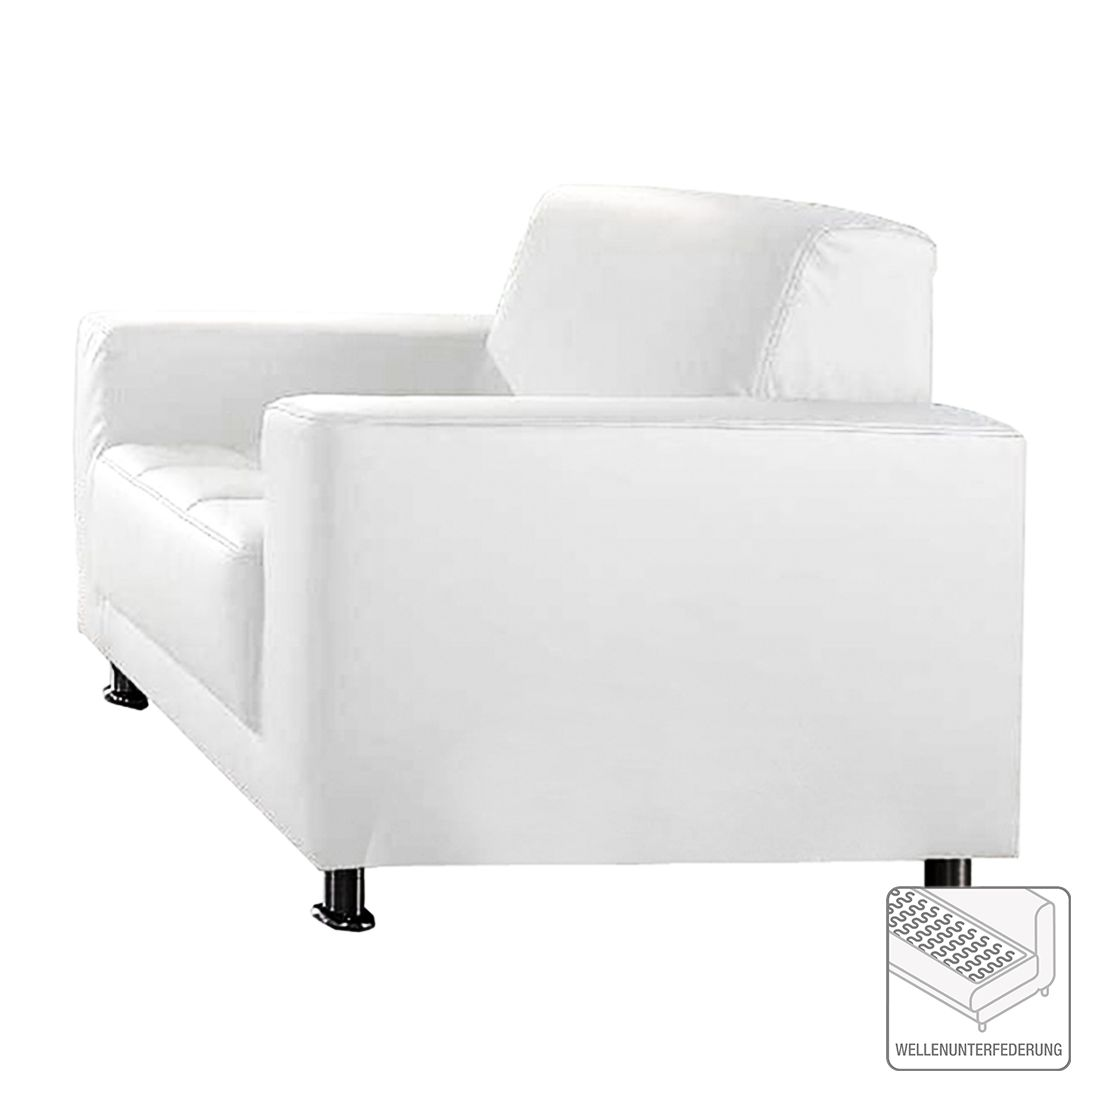 sessel designer preis vergleich 2016. Black Bedroom Furniture Sets. Home Design Ideas